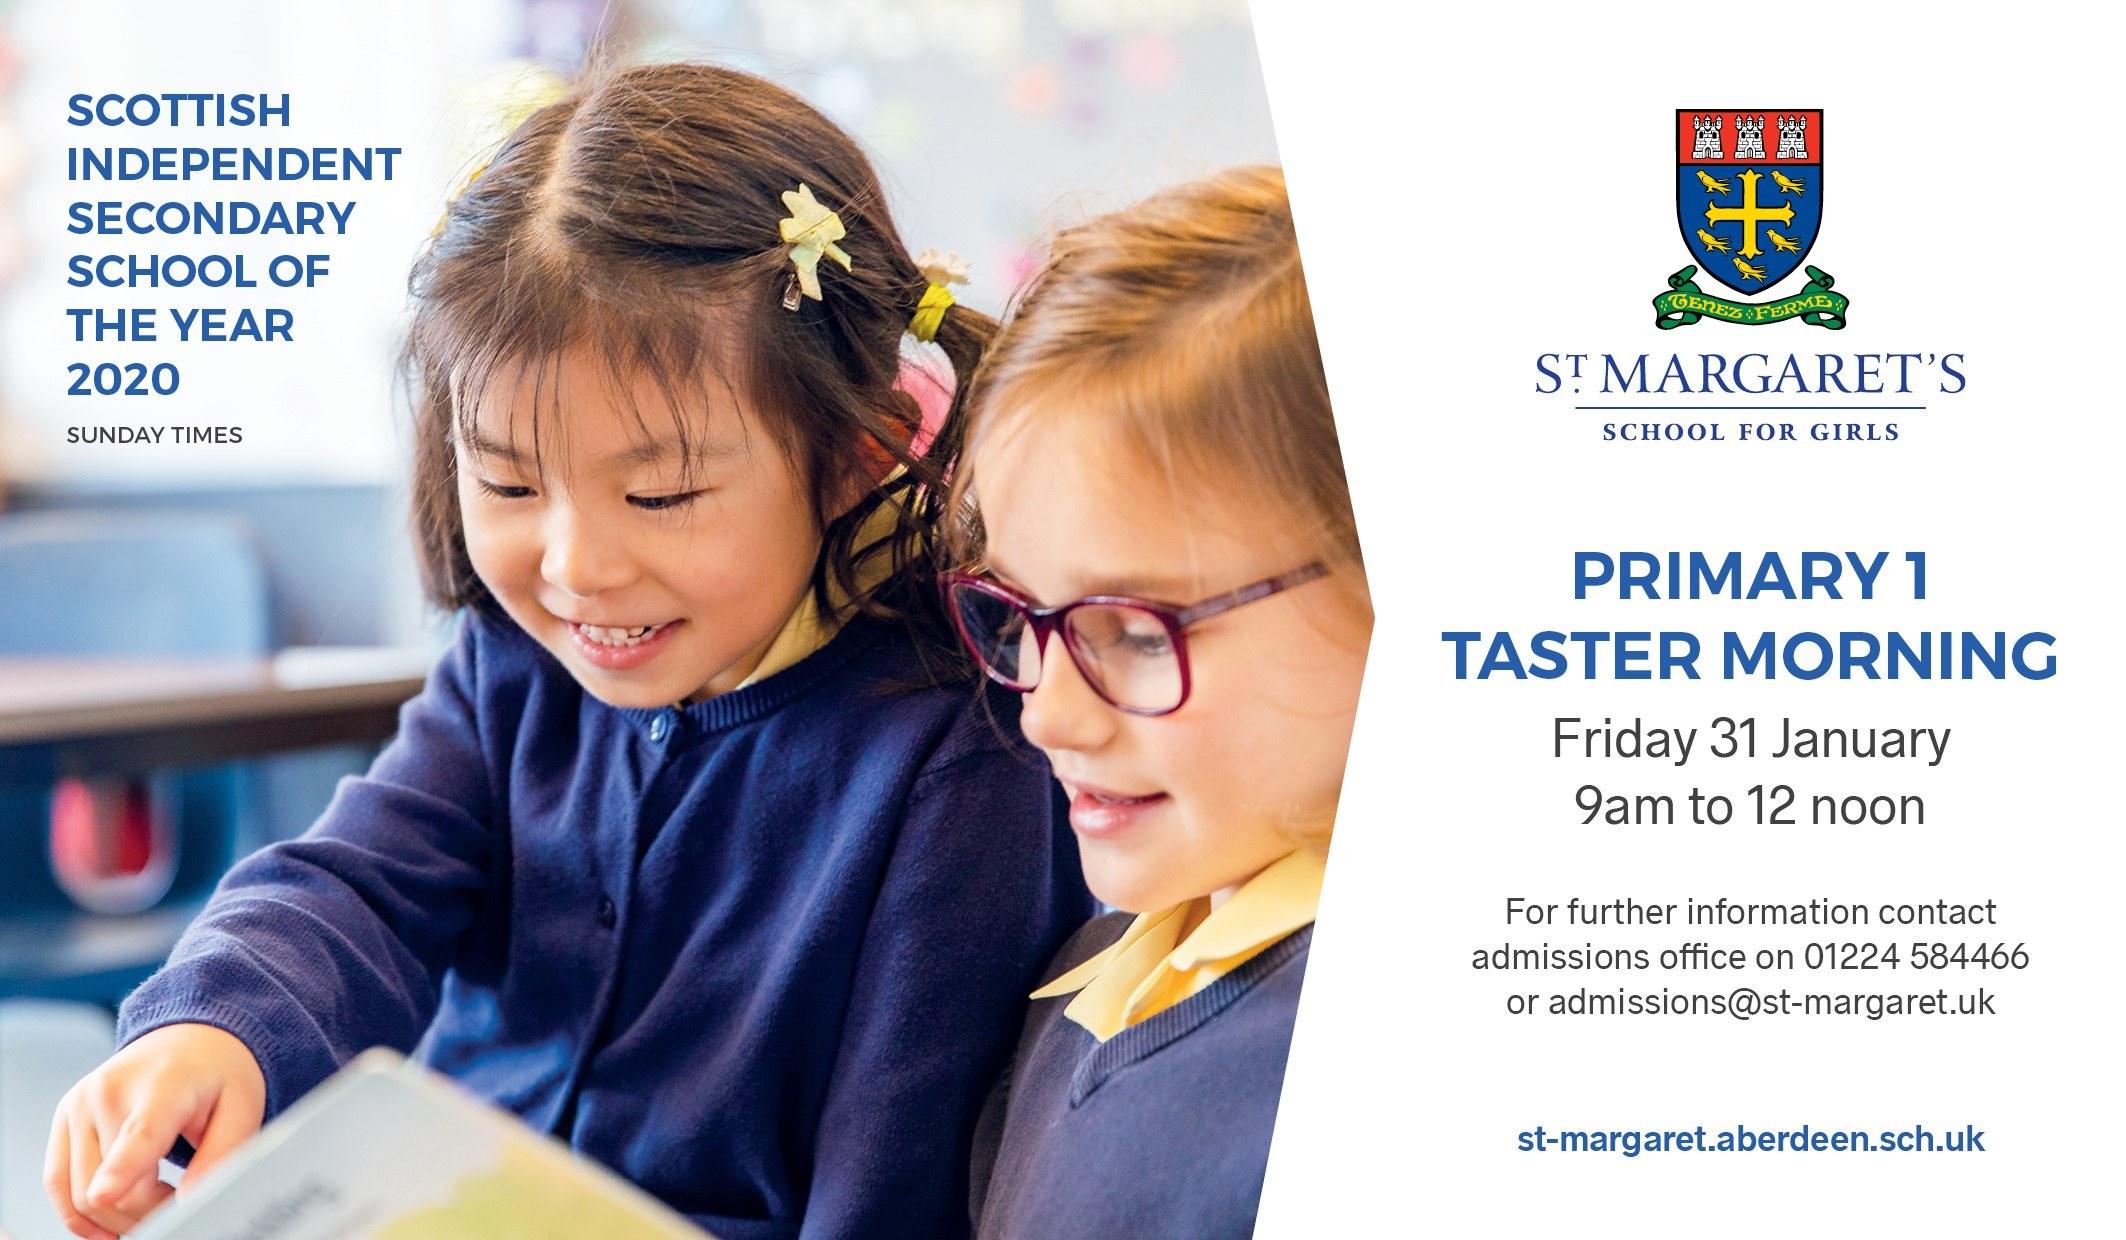 Primary 1 Taster Morning - Friday 31st January 2020